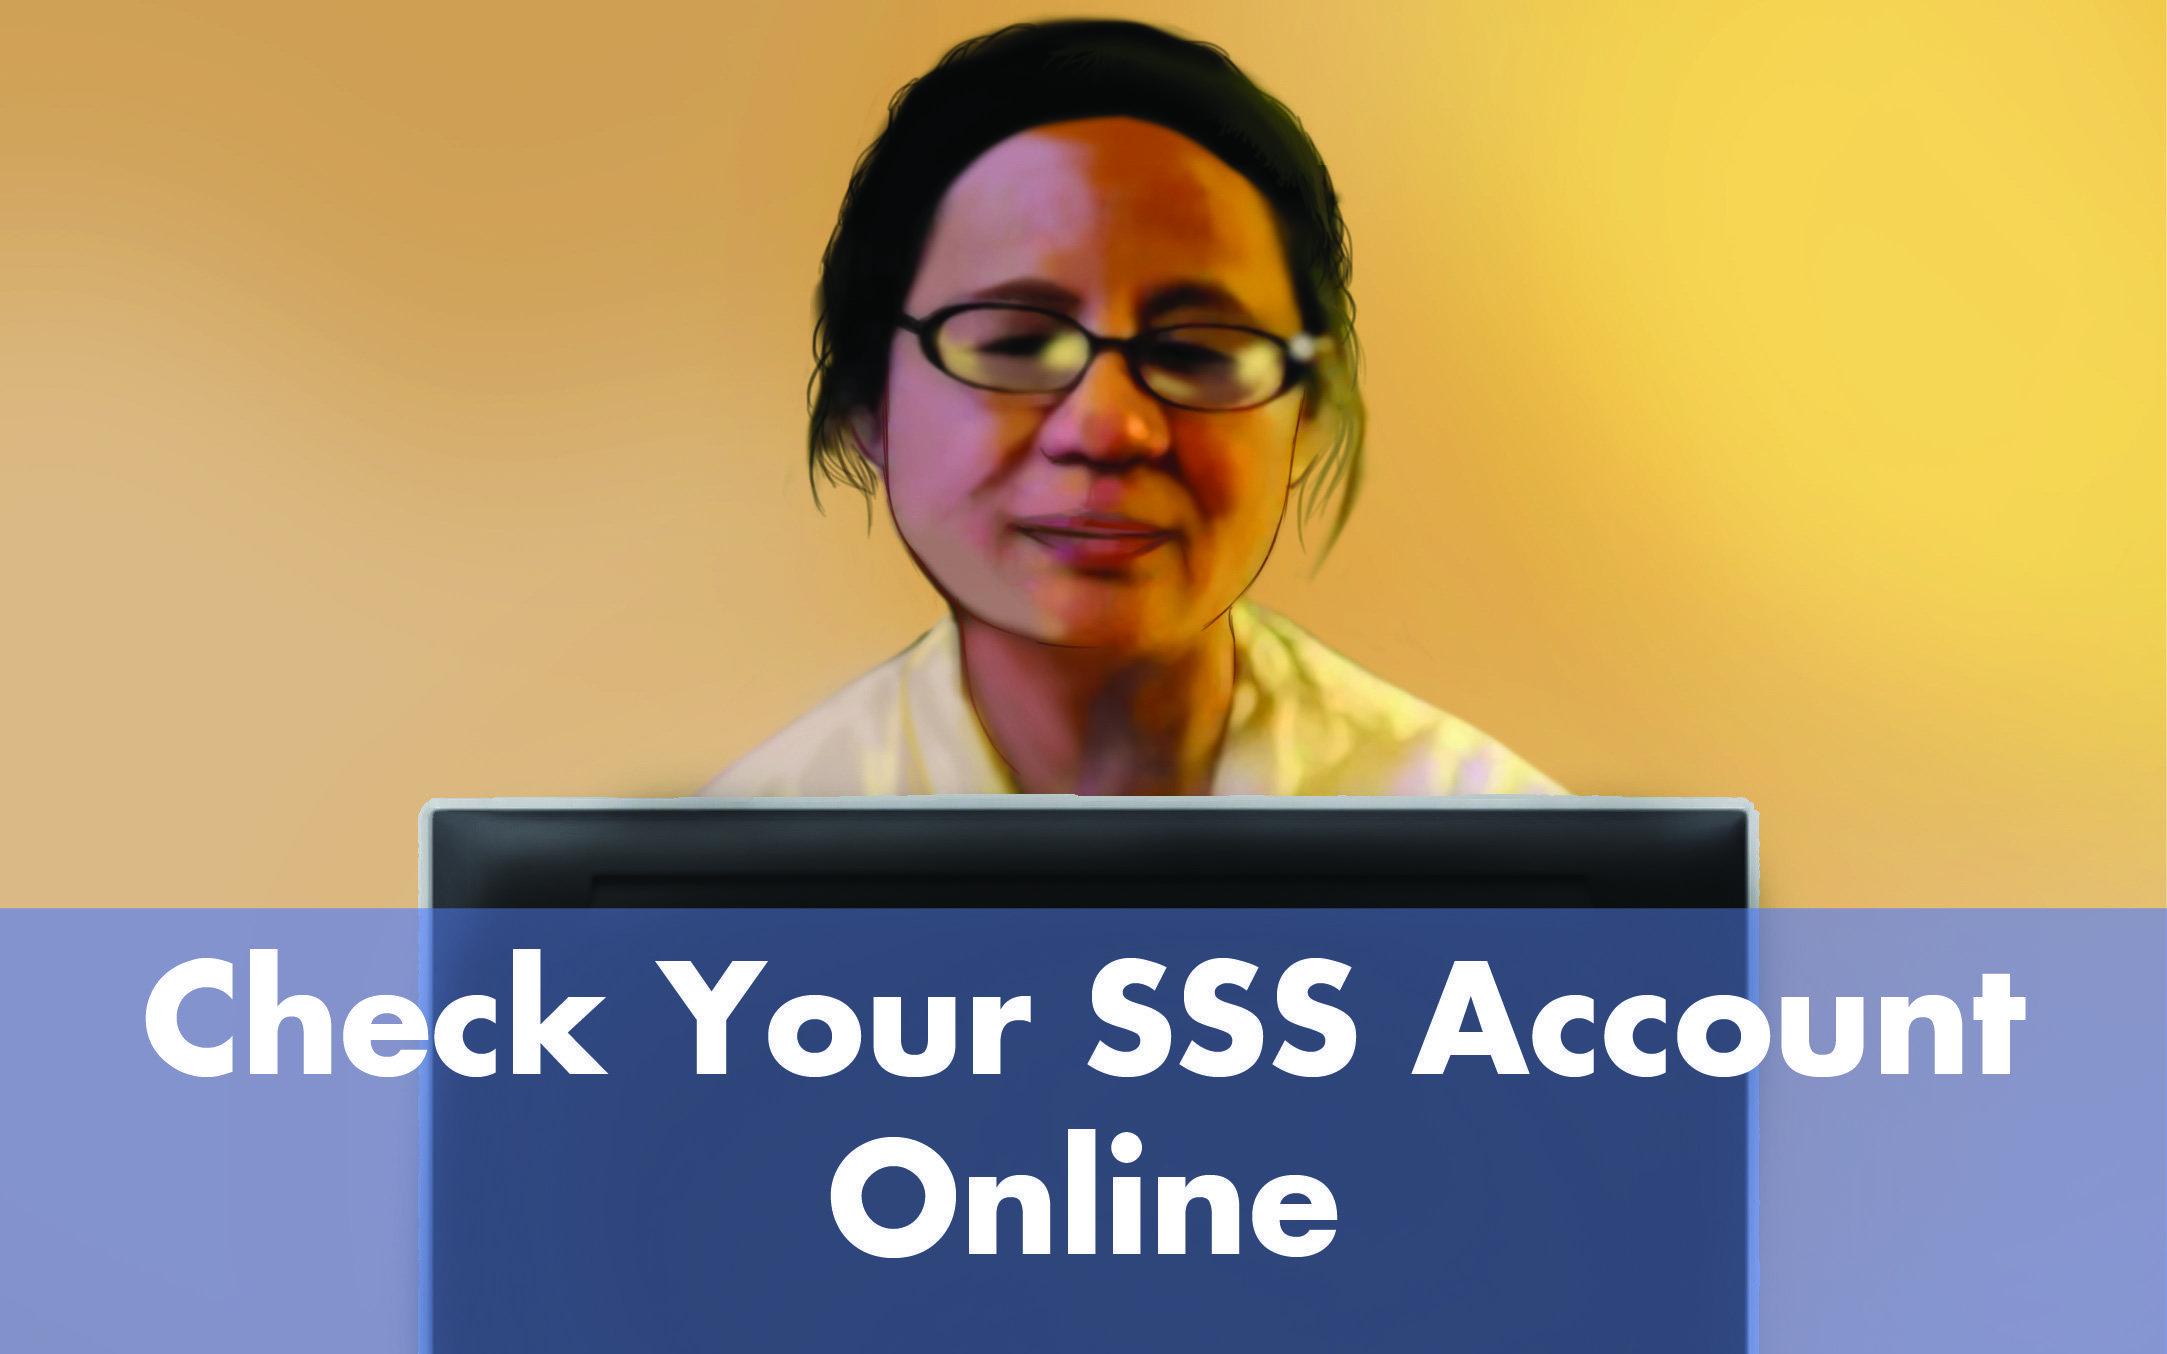 42dbb7e78a278682dccfab2274c92cb7 - How To Check My Sss Loan Application